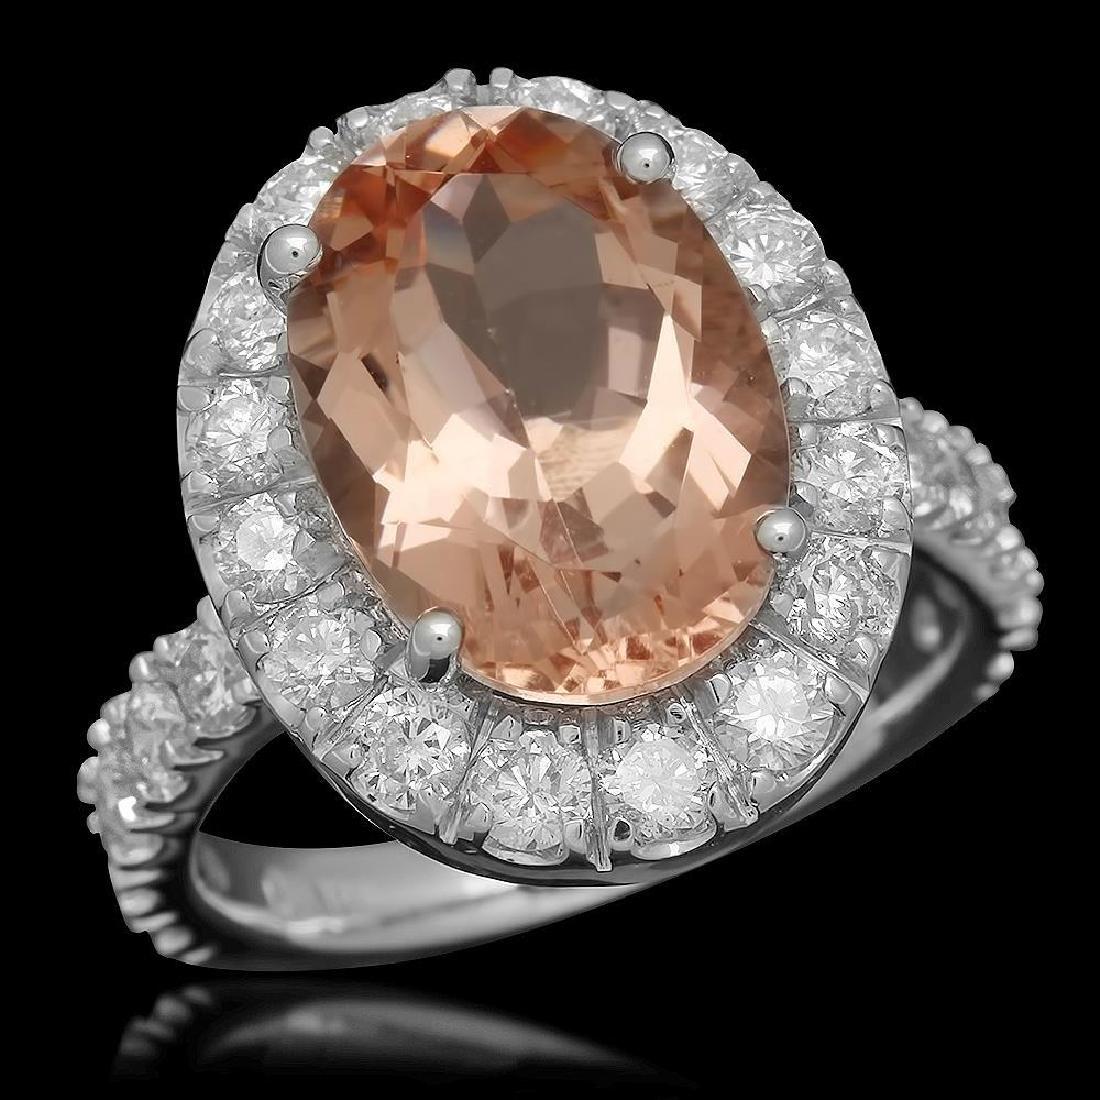 14K Gold 5.84ct Morganite 1.81ct Diamond Ring